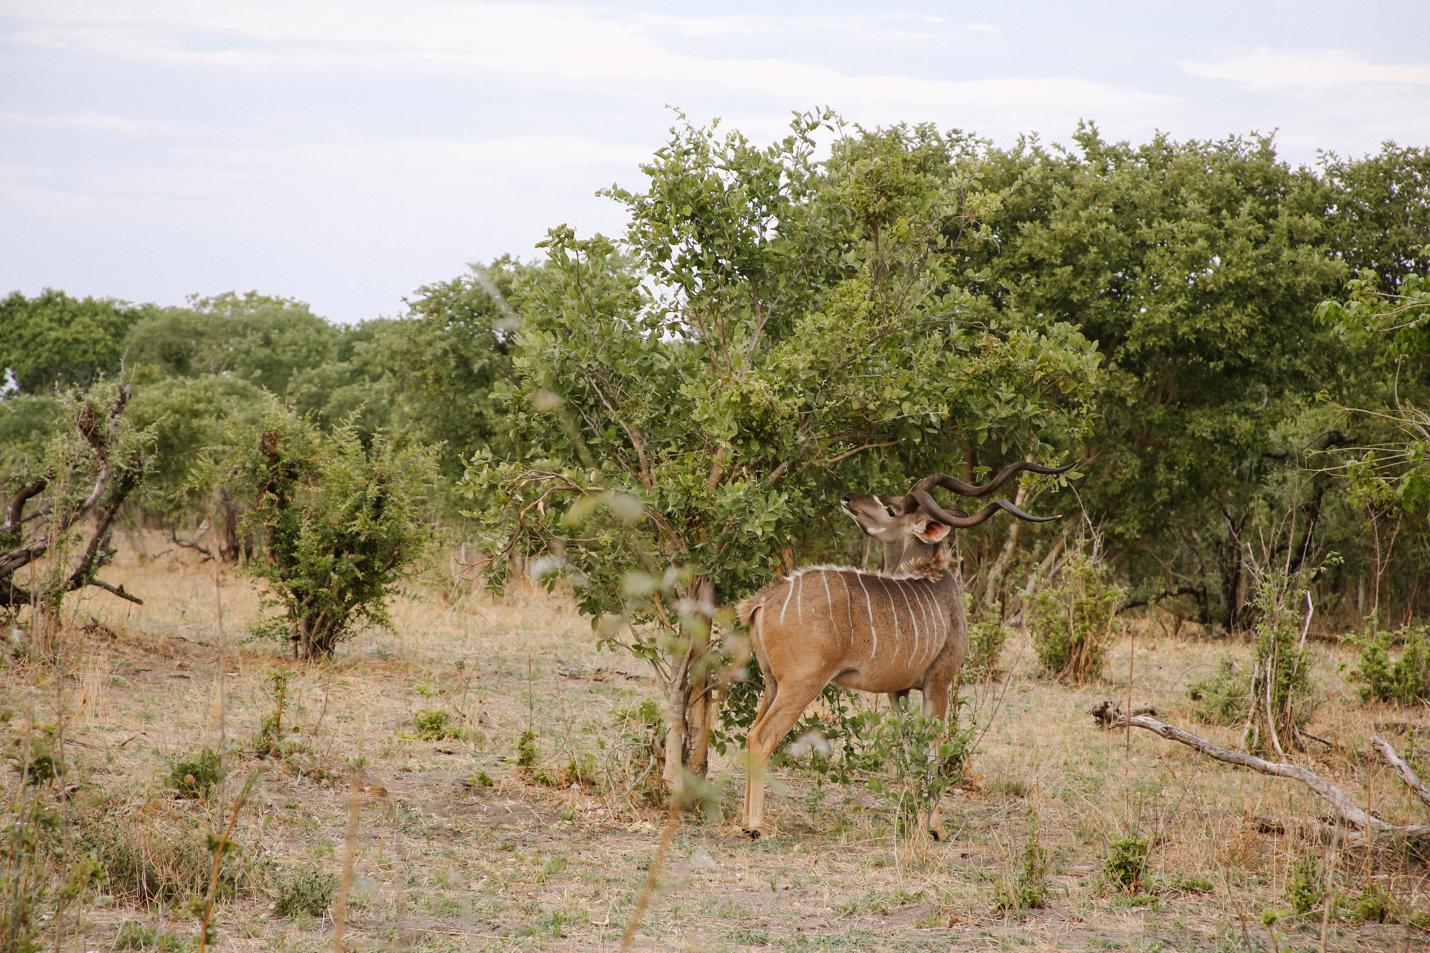 Africa - LindsayBrown -WEB-3948.jpg